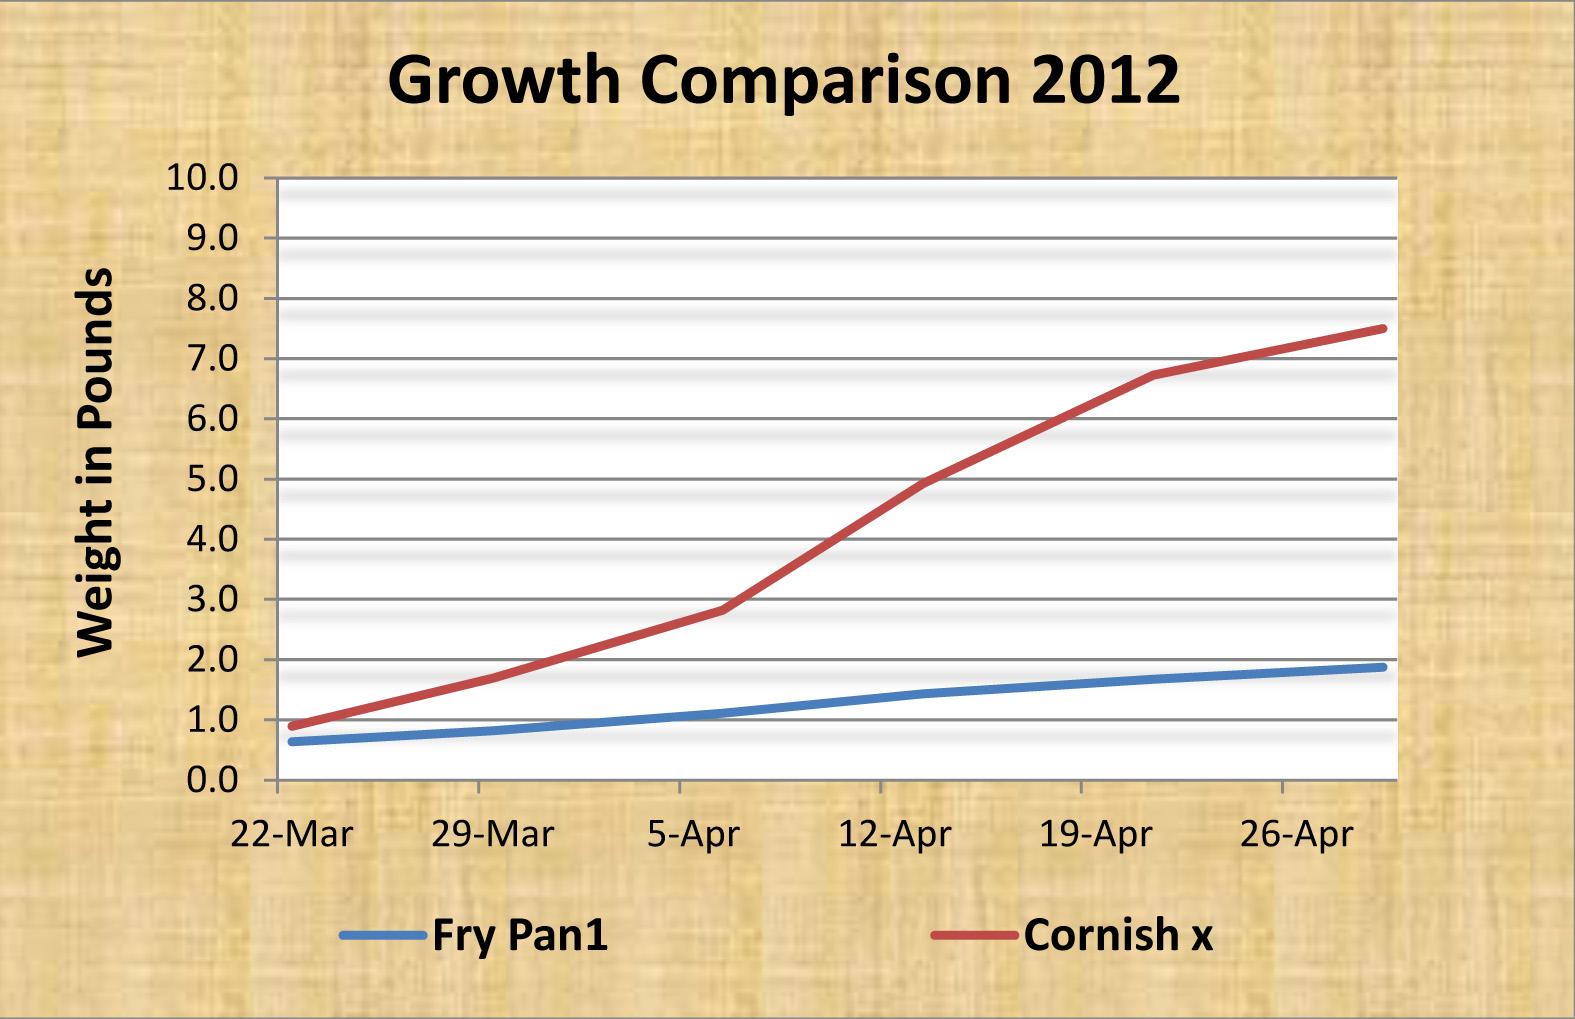 Cornish cross growth chart choice image free any chart examples cornish cross growth chart images free any chart examples cornish cross growth chart choice image free nvjuhfo Image collections